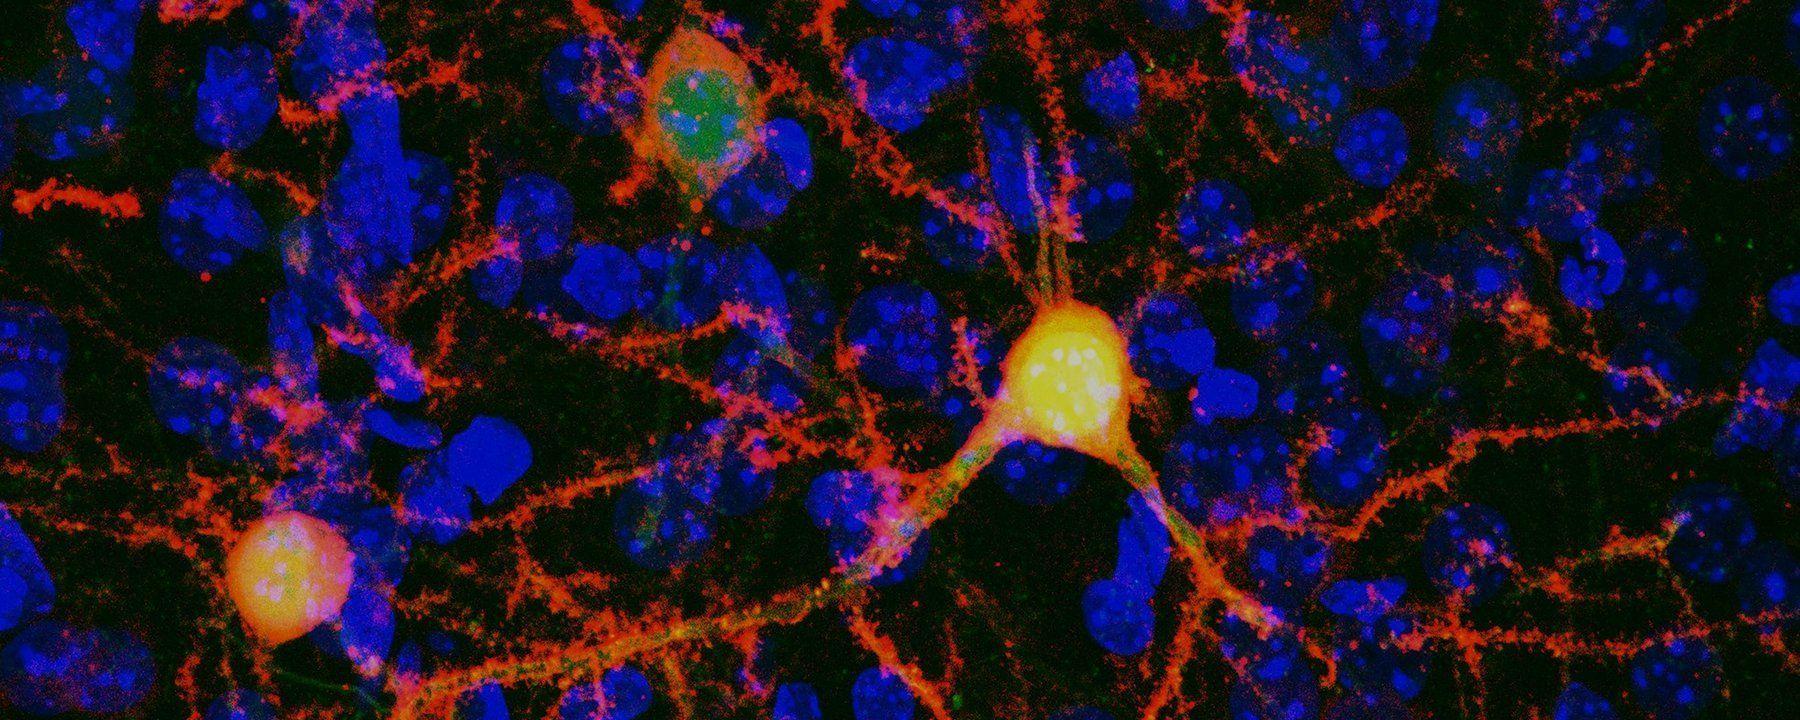 Chemogenetics Method Uses Anti-Smoking Drug to Control Cells